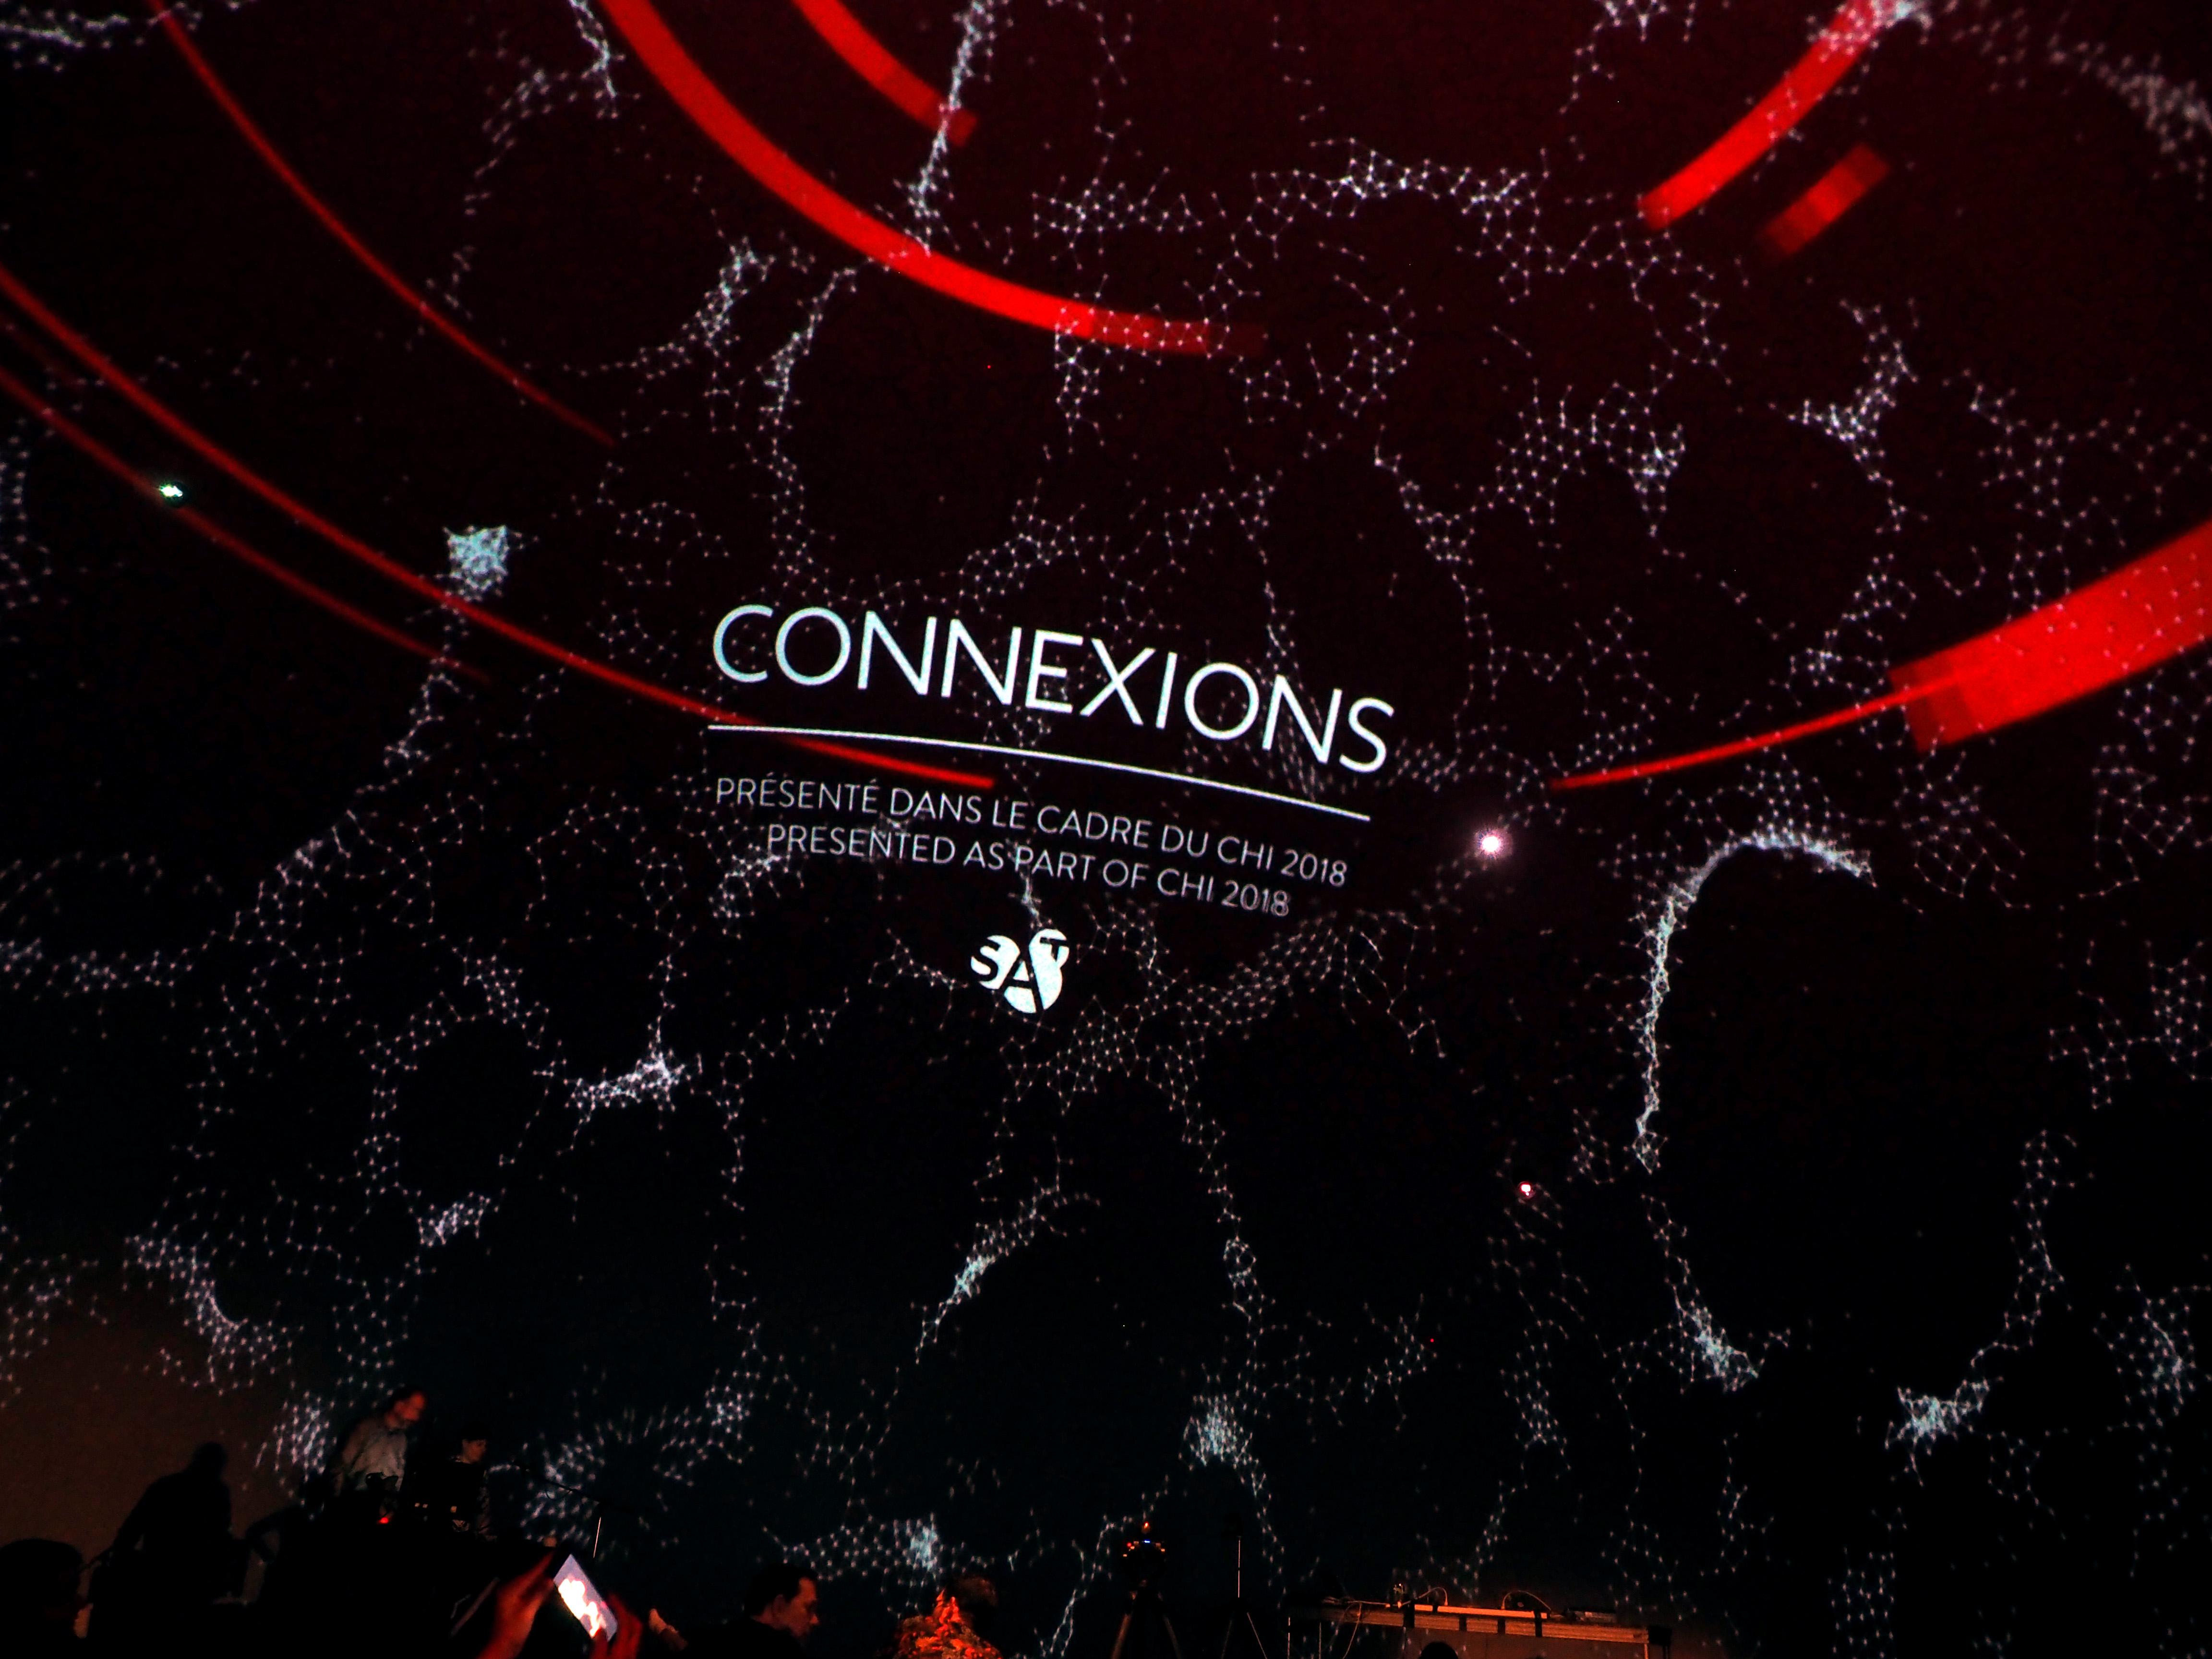 SIGCHI Connexions Art Exhibition